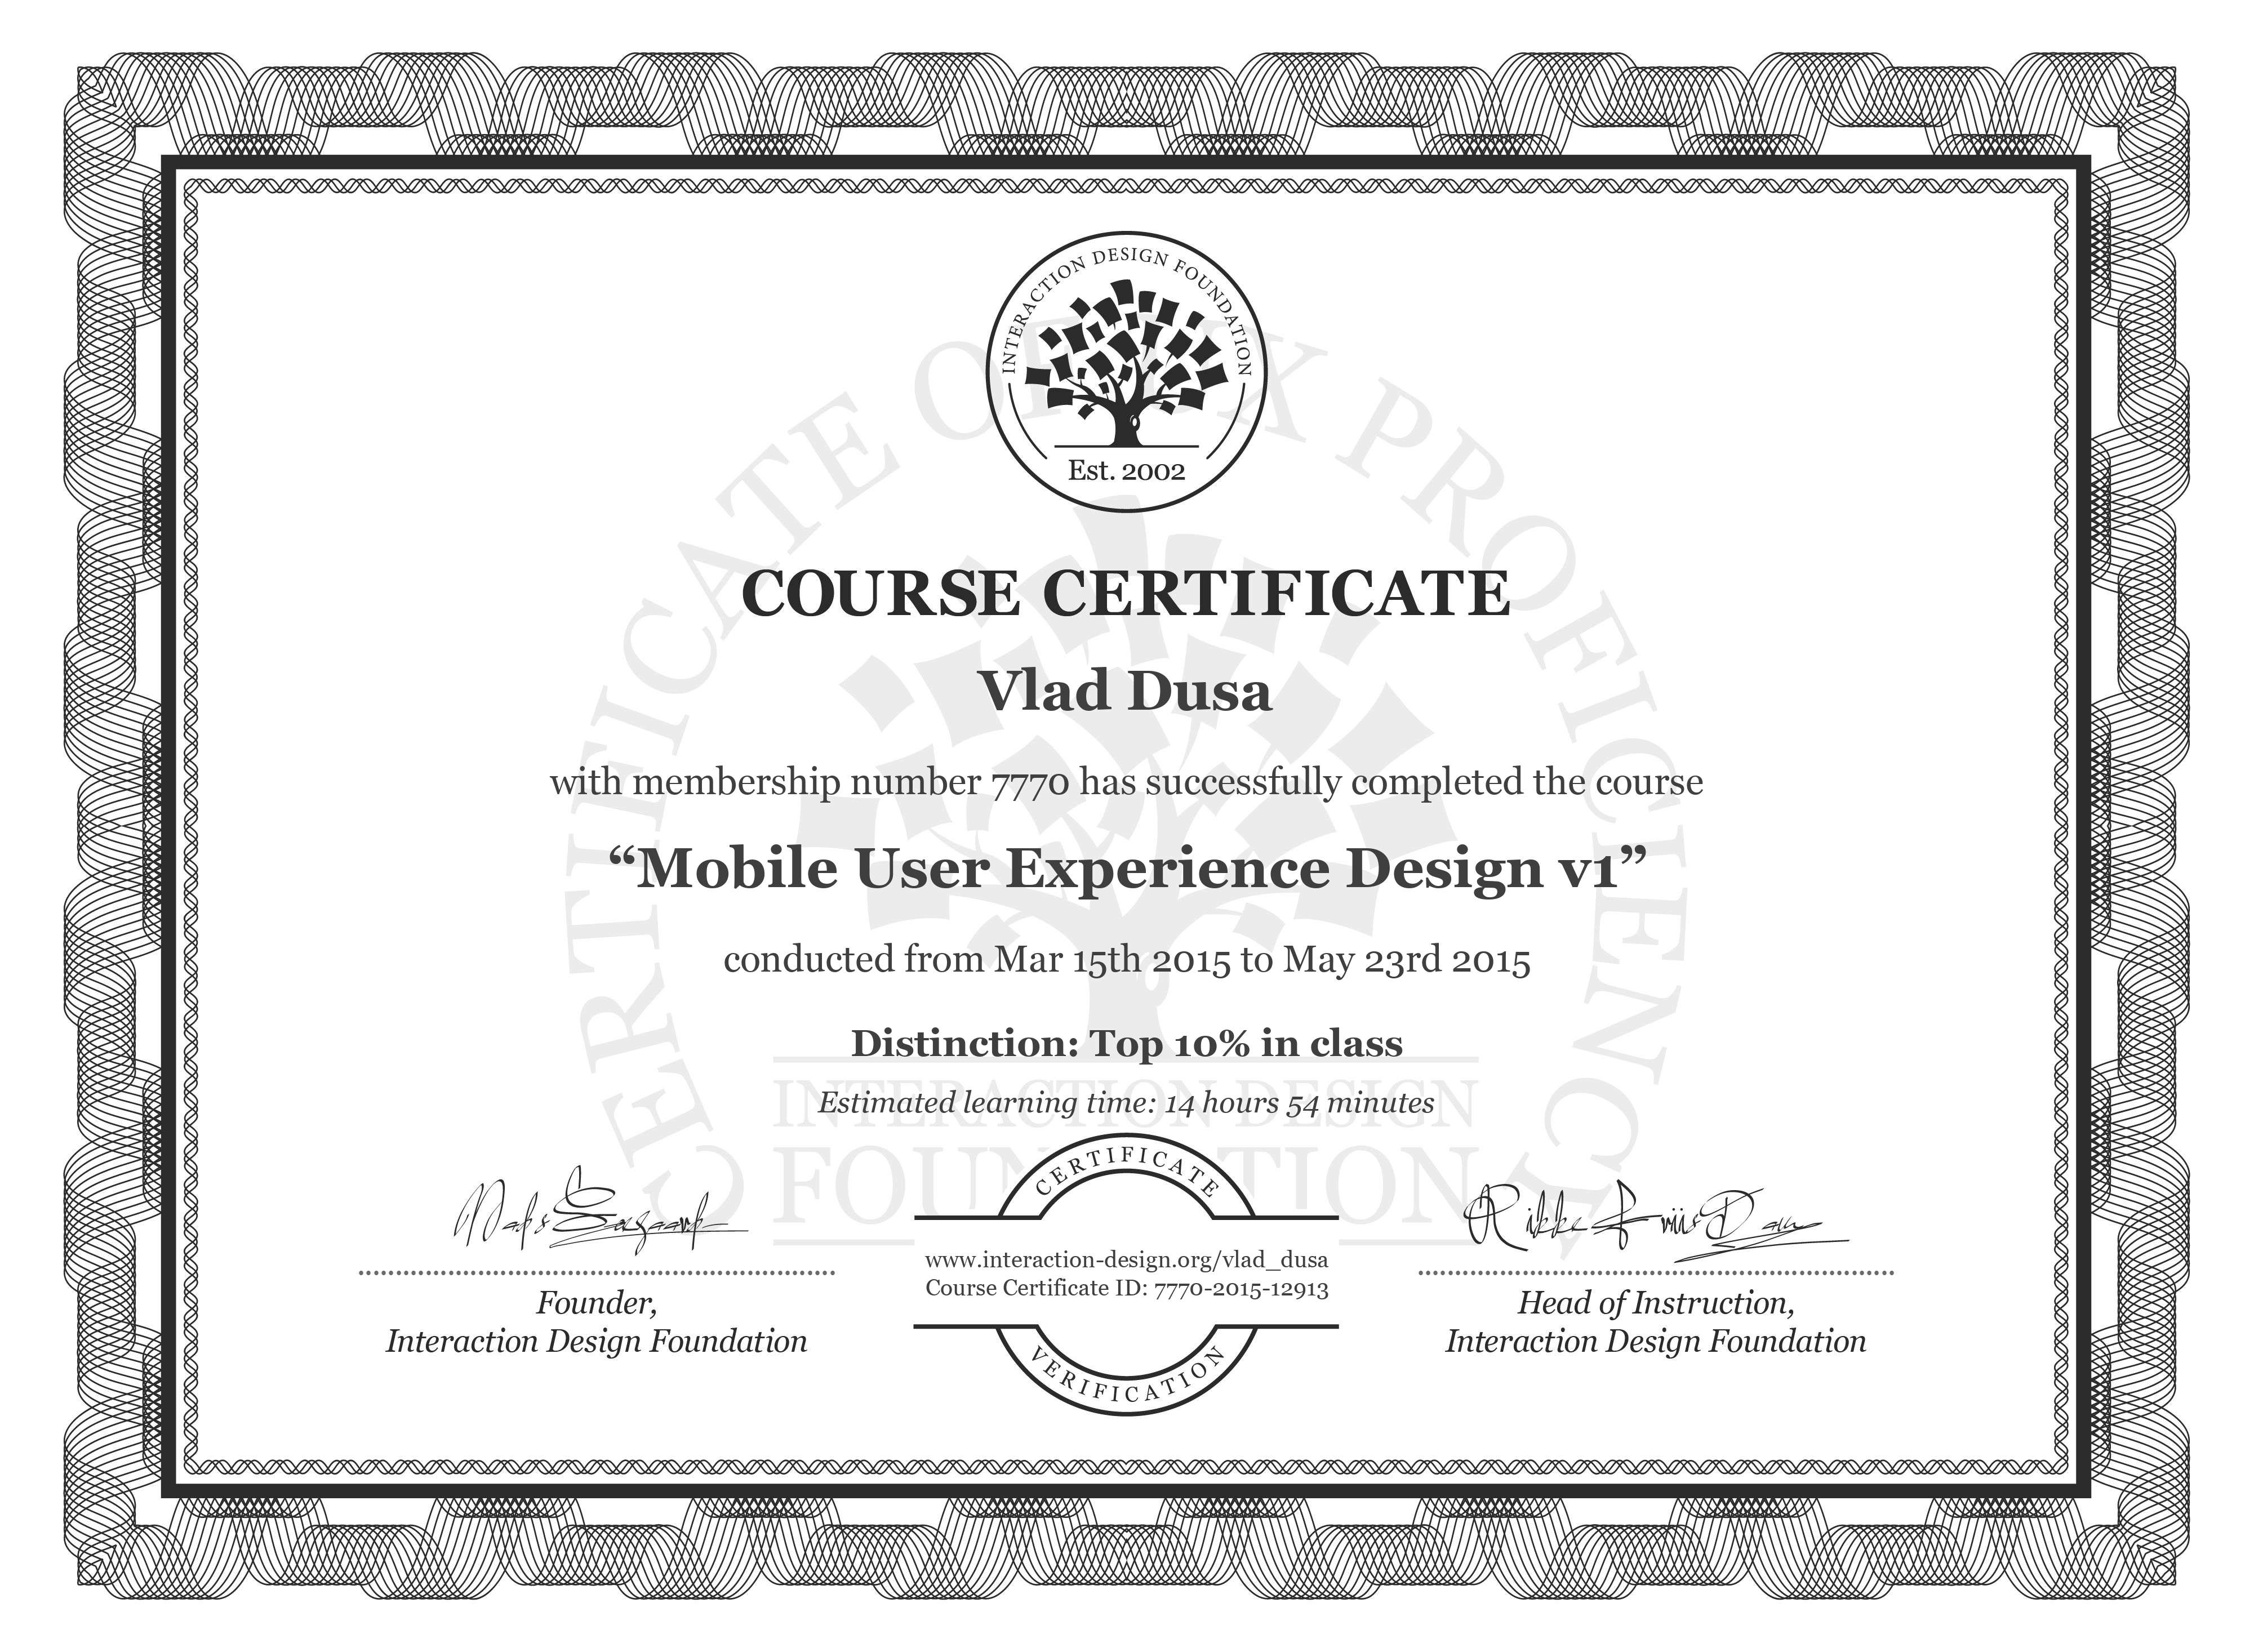 Vlad Dusa's Course Certificate: Mobile User Experience Design